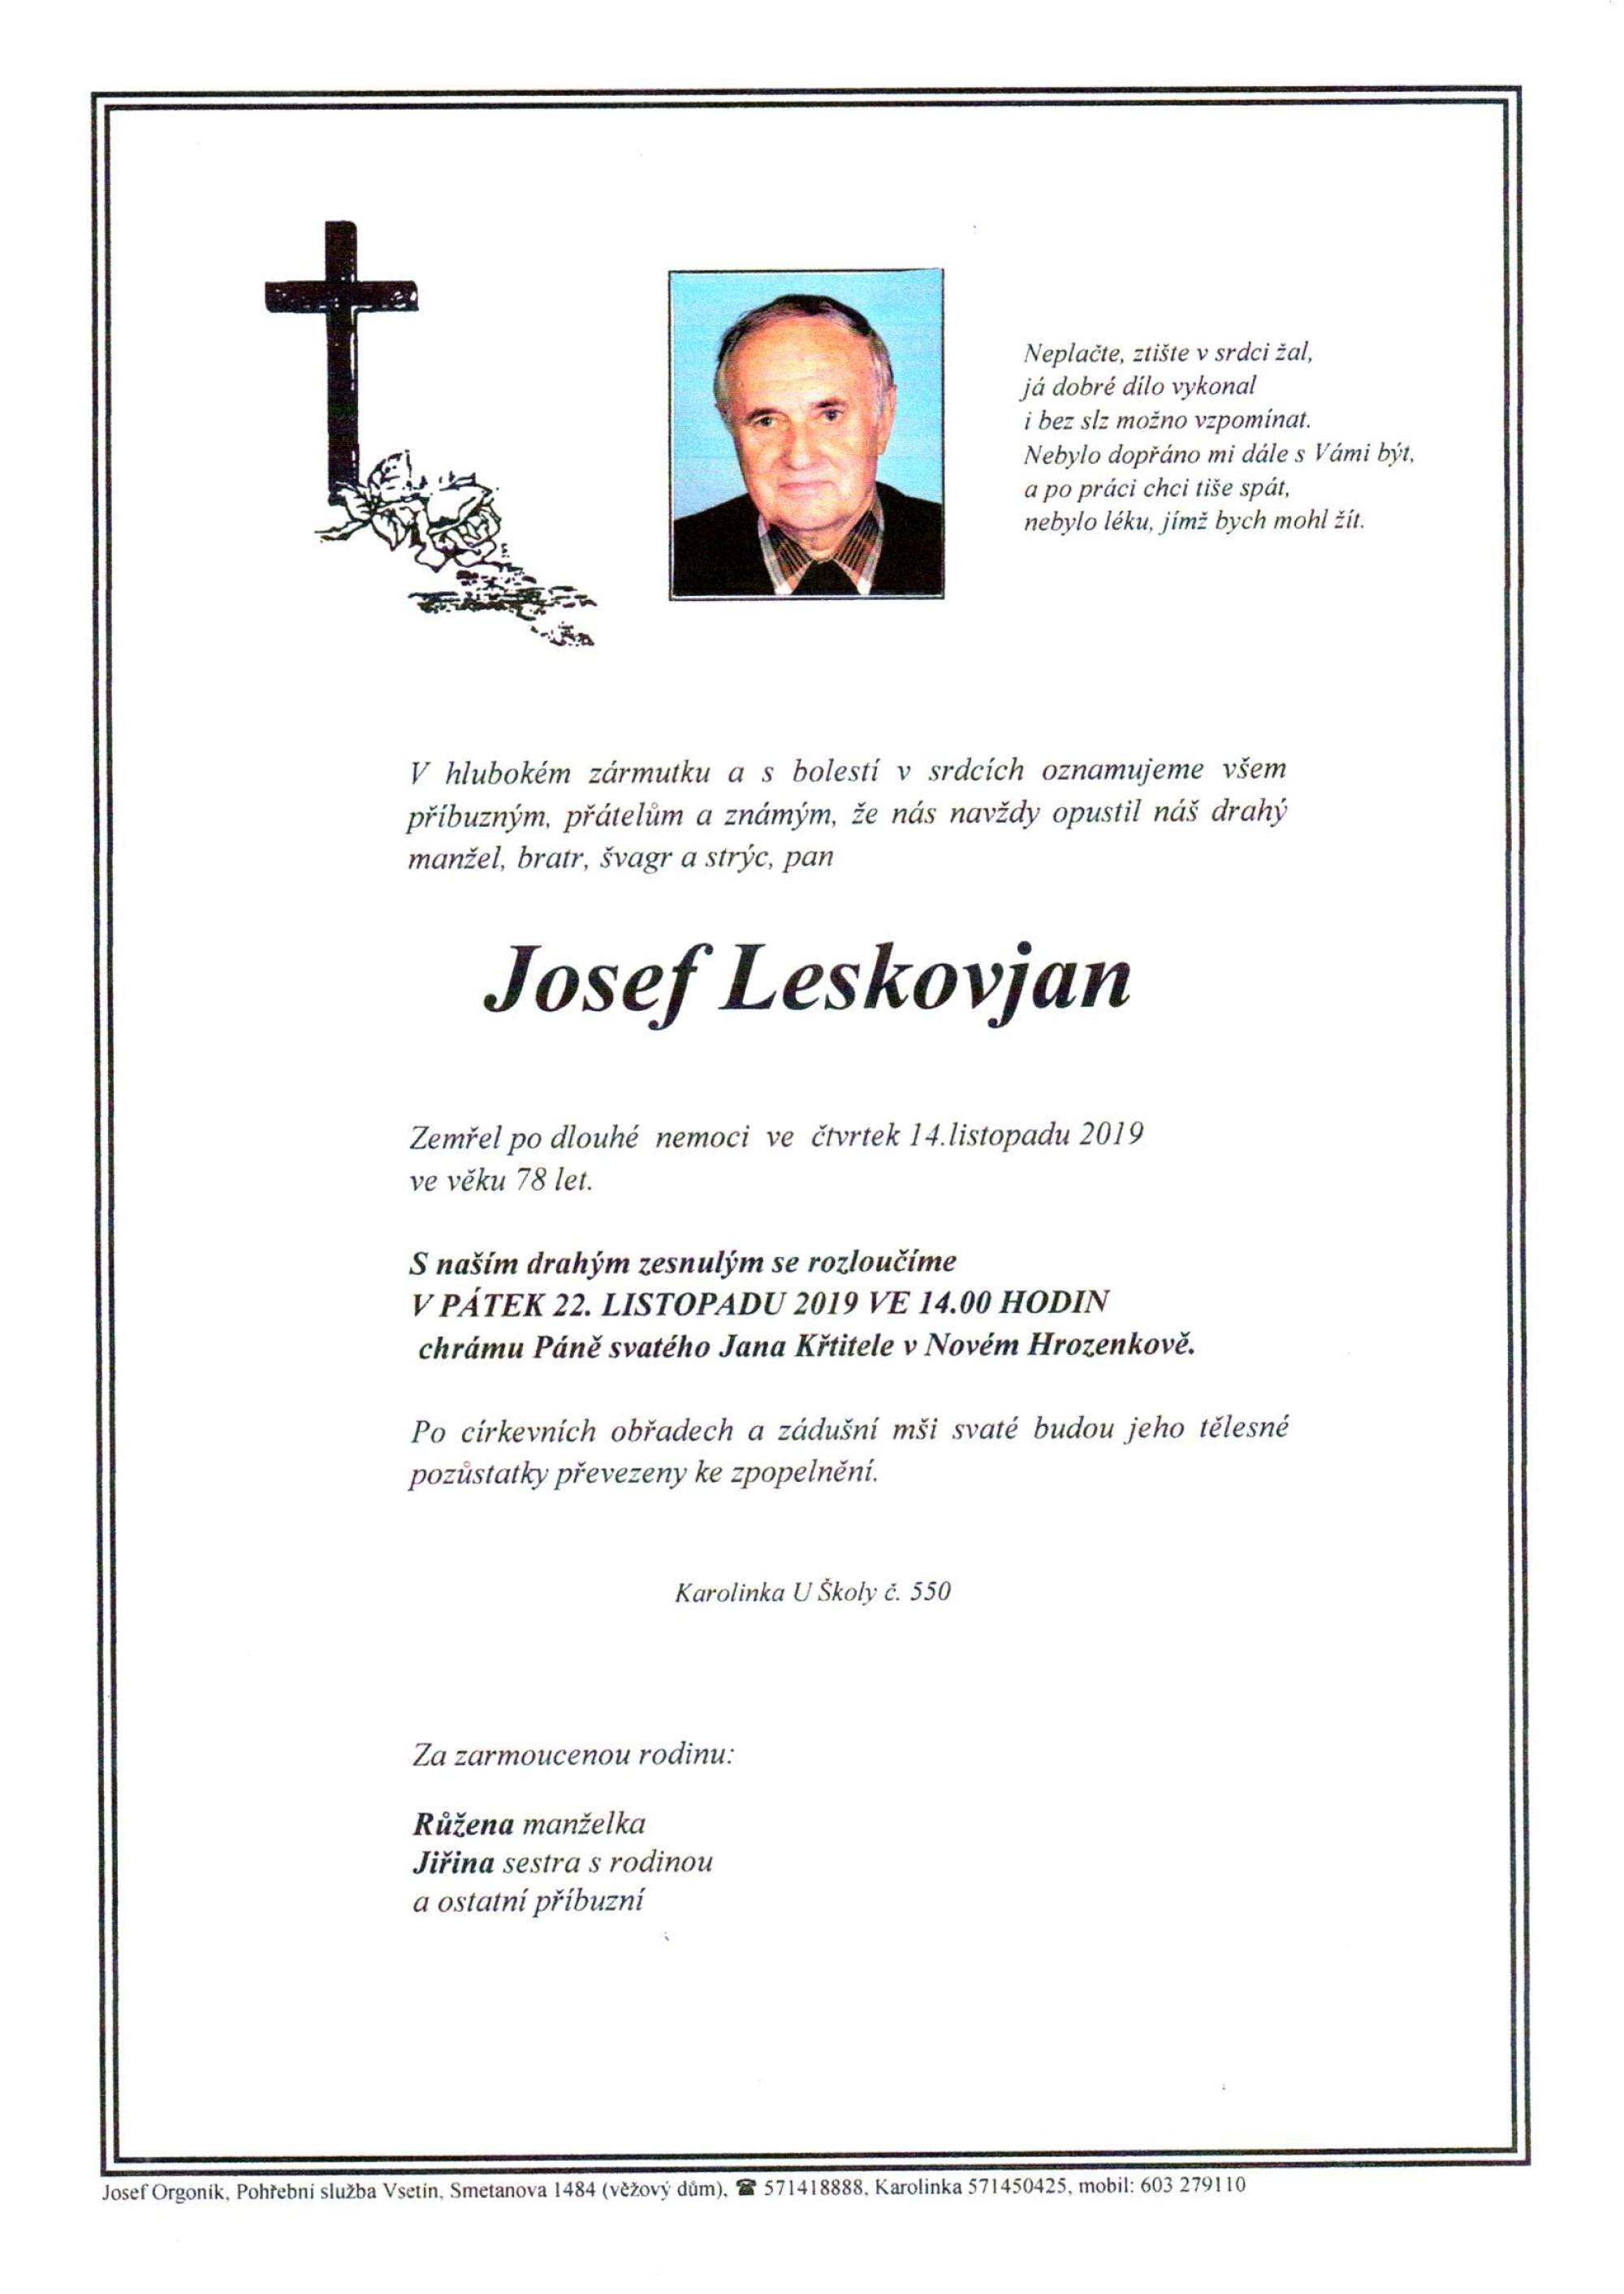 Josef Leskovjan